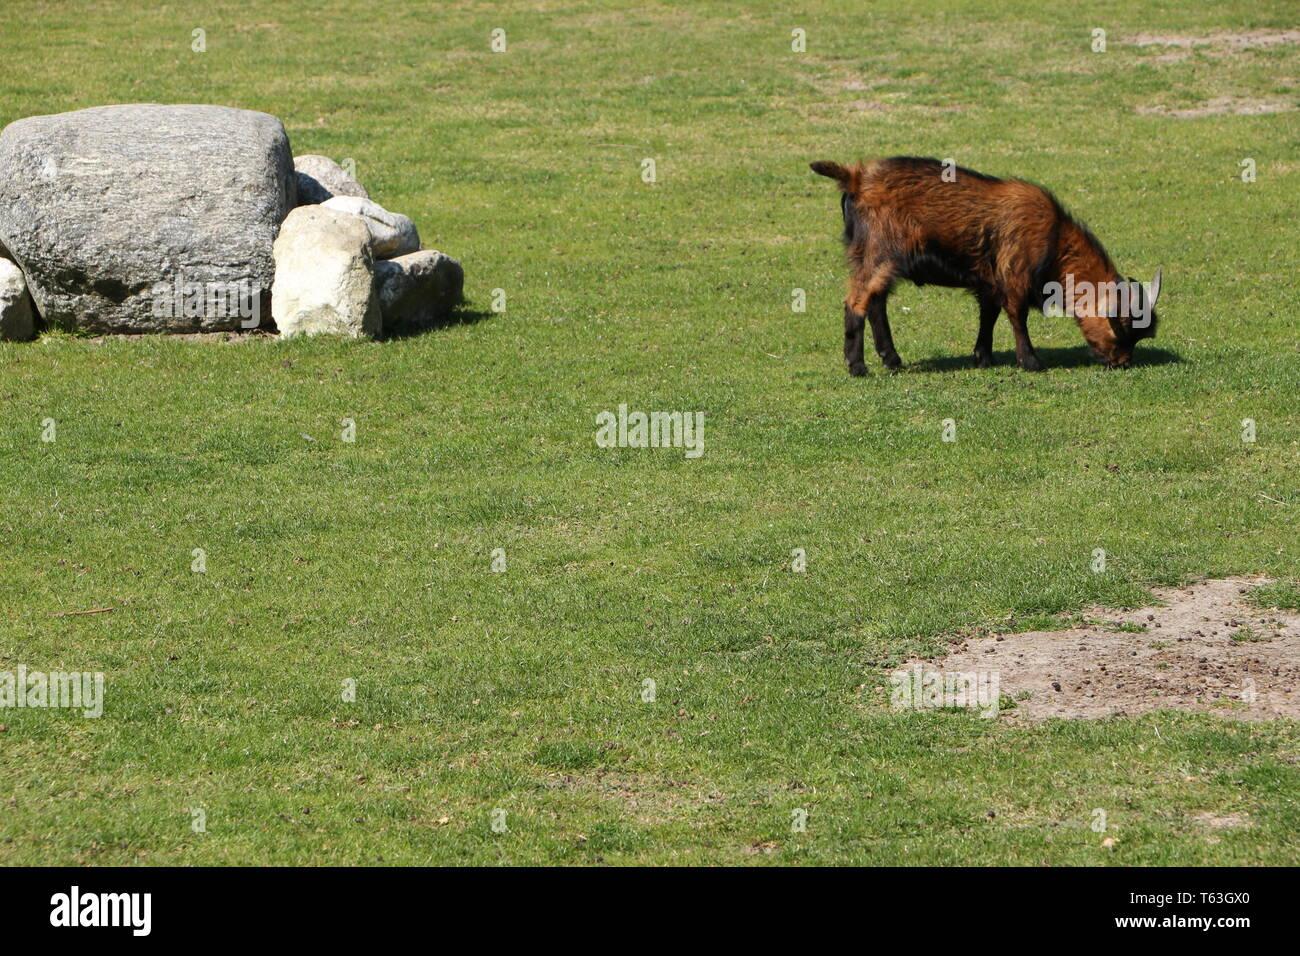 Ziege in einem Tiergehege in Brouwershaven in Holland Stock Photo